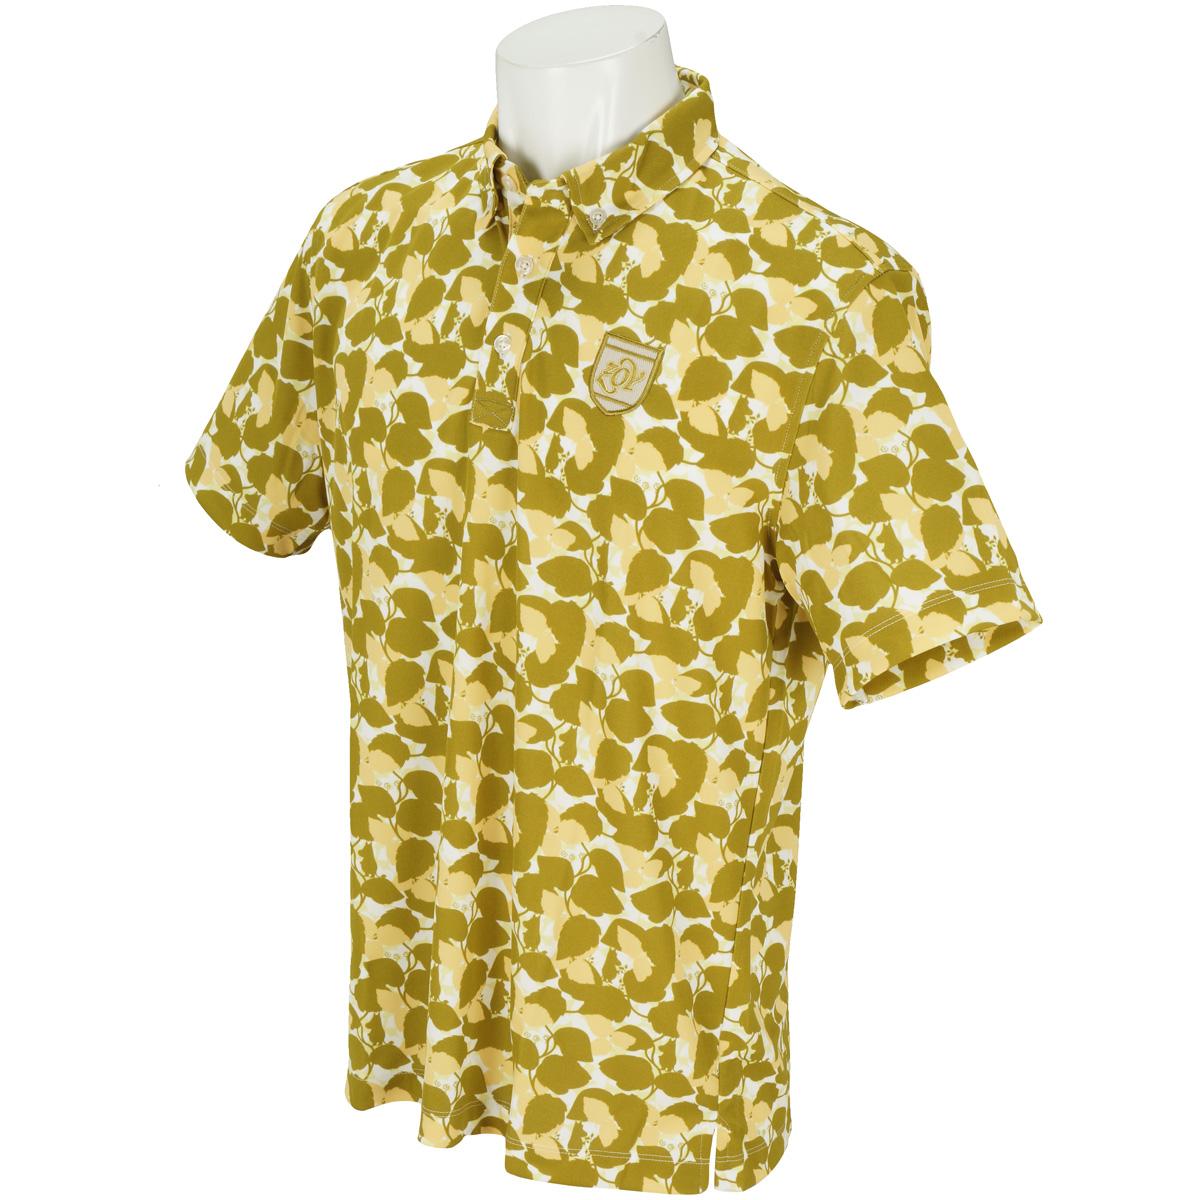 Moomin リーフプリント 半袖ポロシャツ